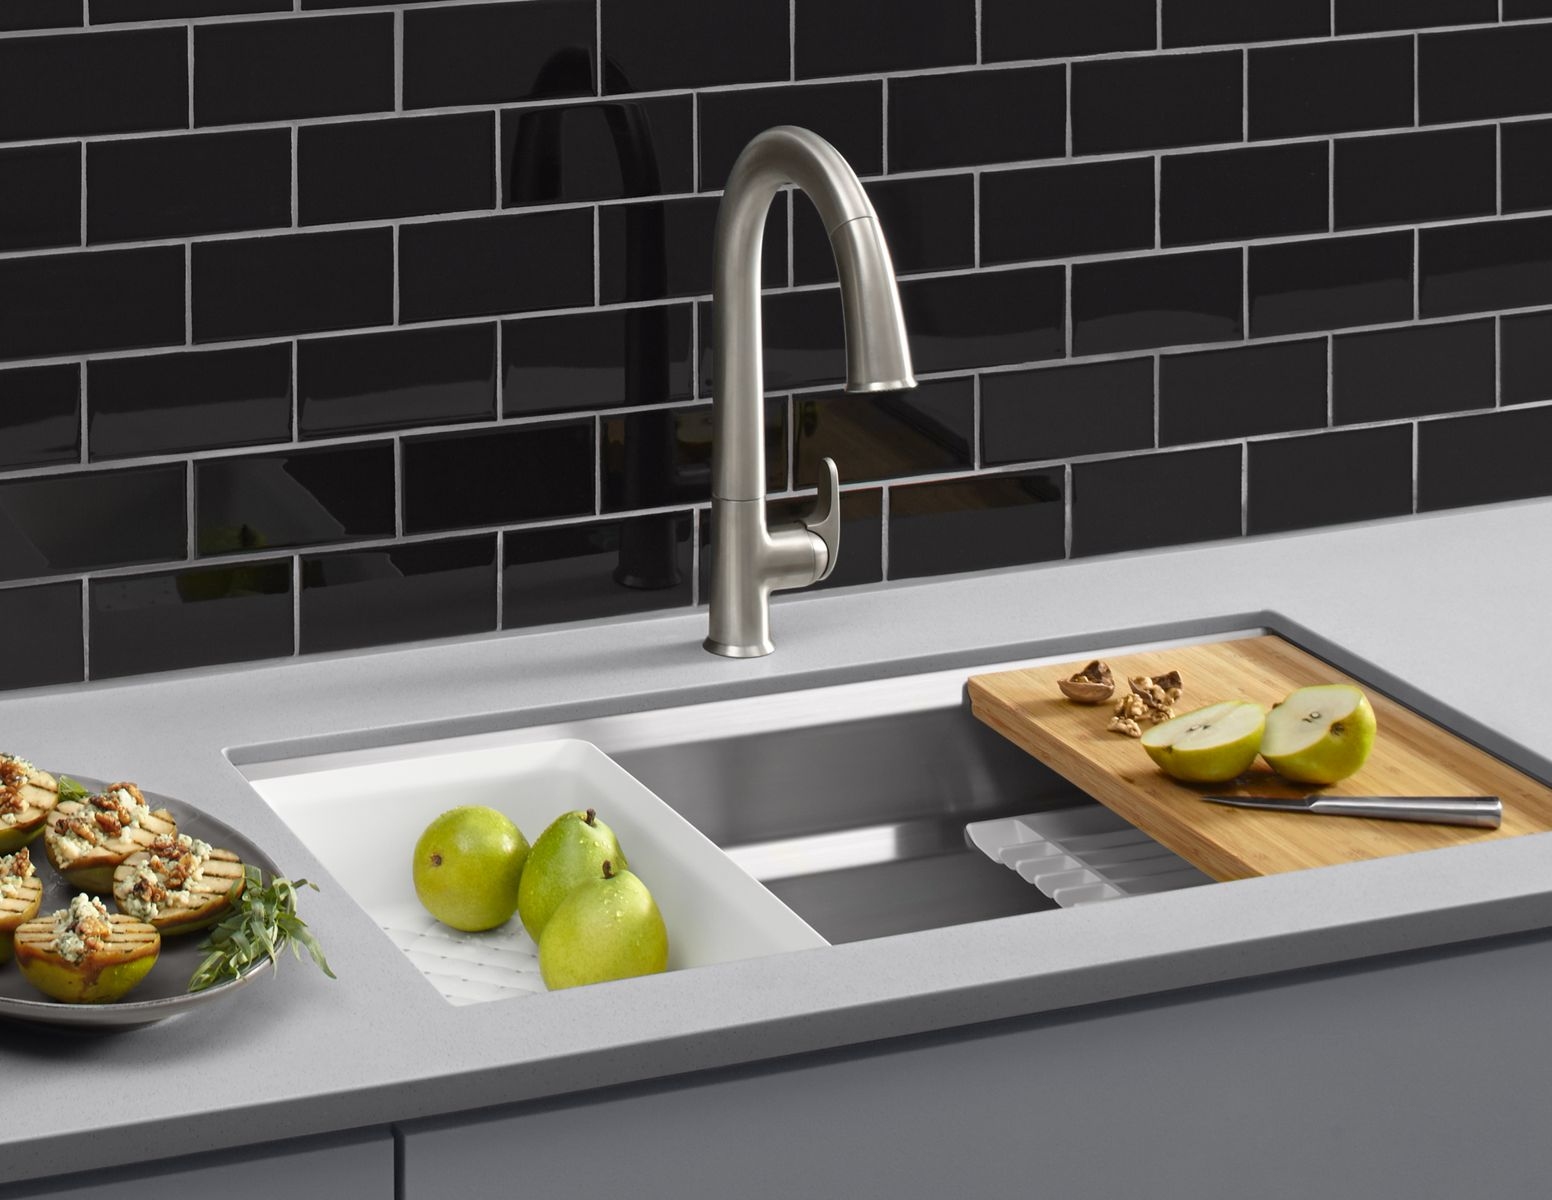 Kohler toilets showers sinks faucets and more for - Losas de cocina ...